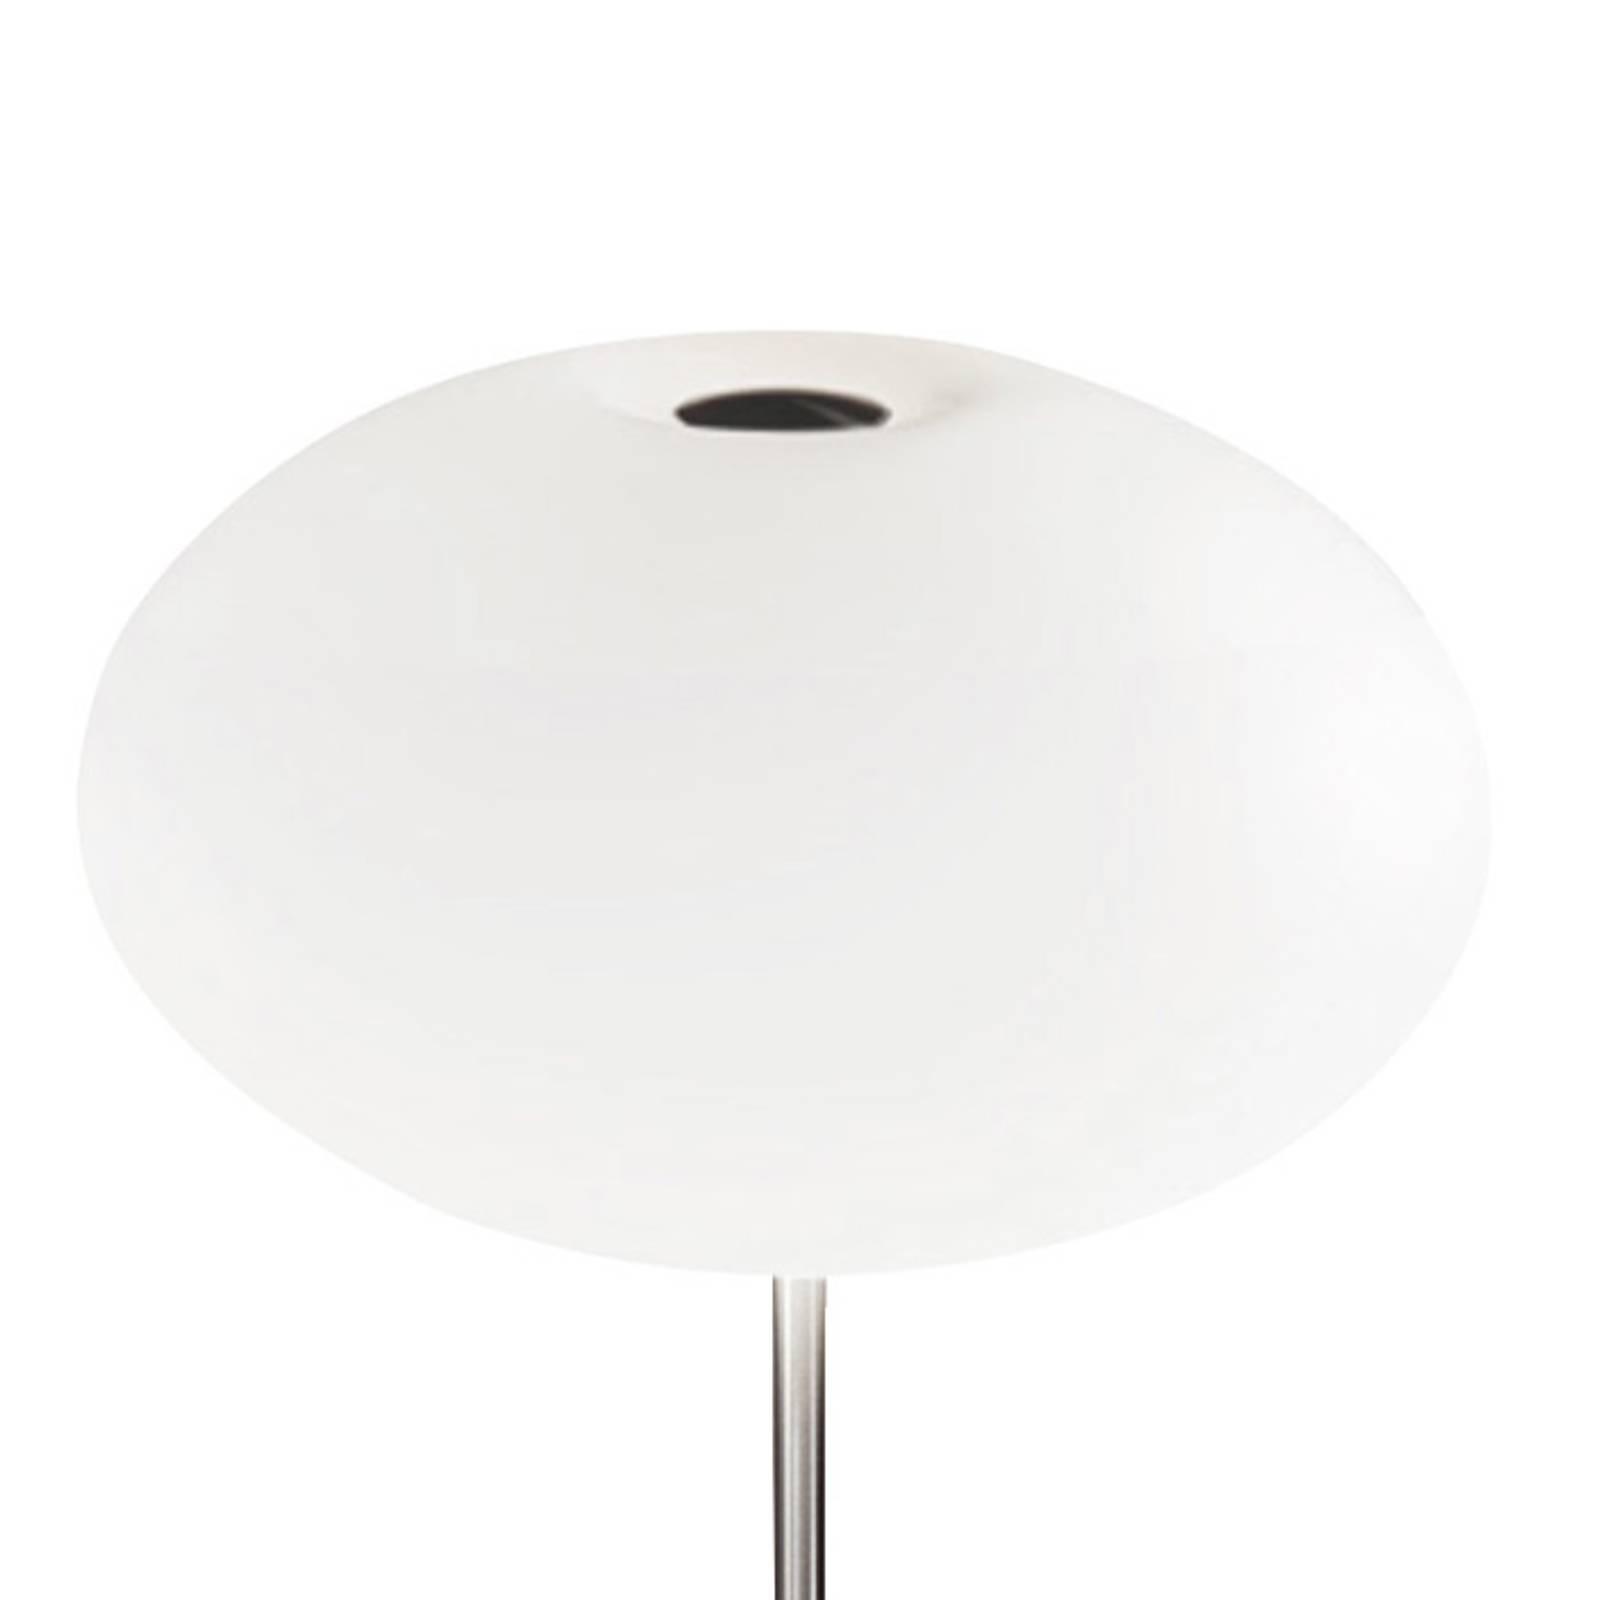 Casablanca Aih pöytälamppu, Ø 28 cm matta